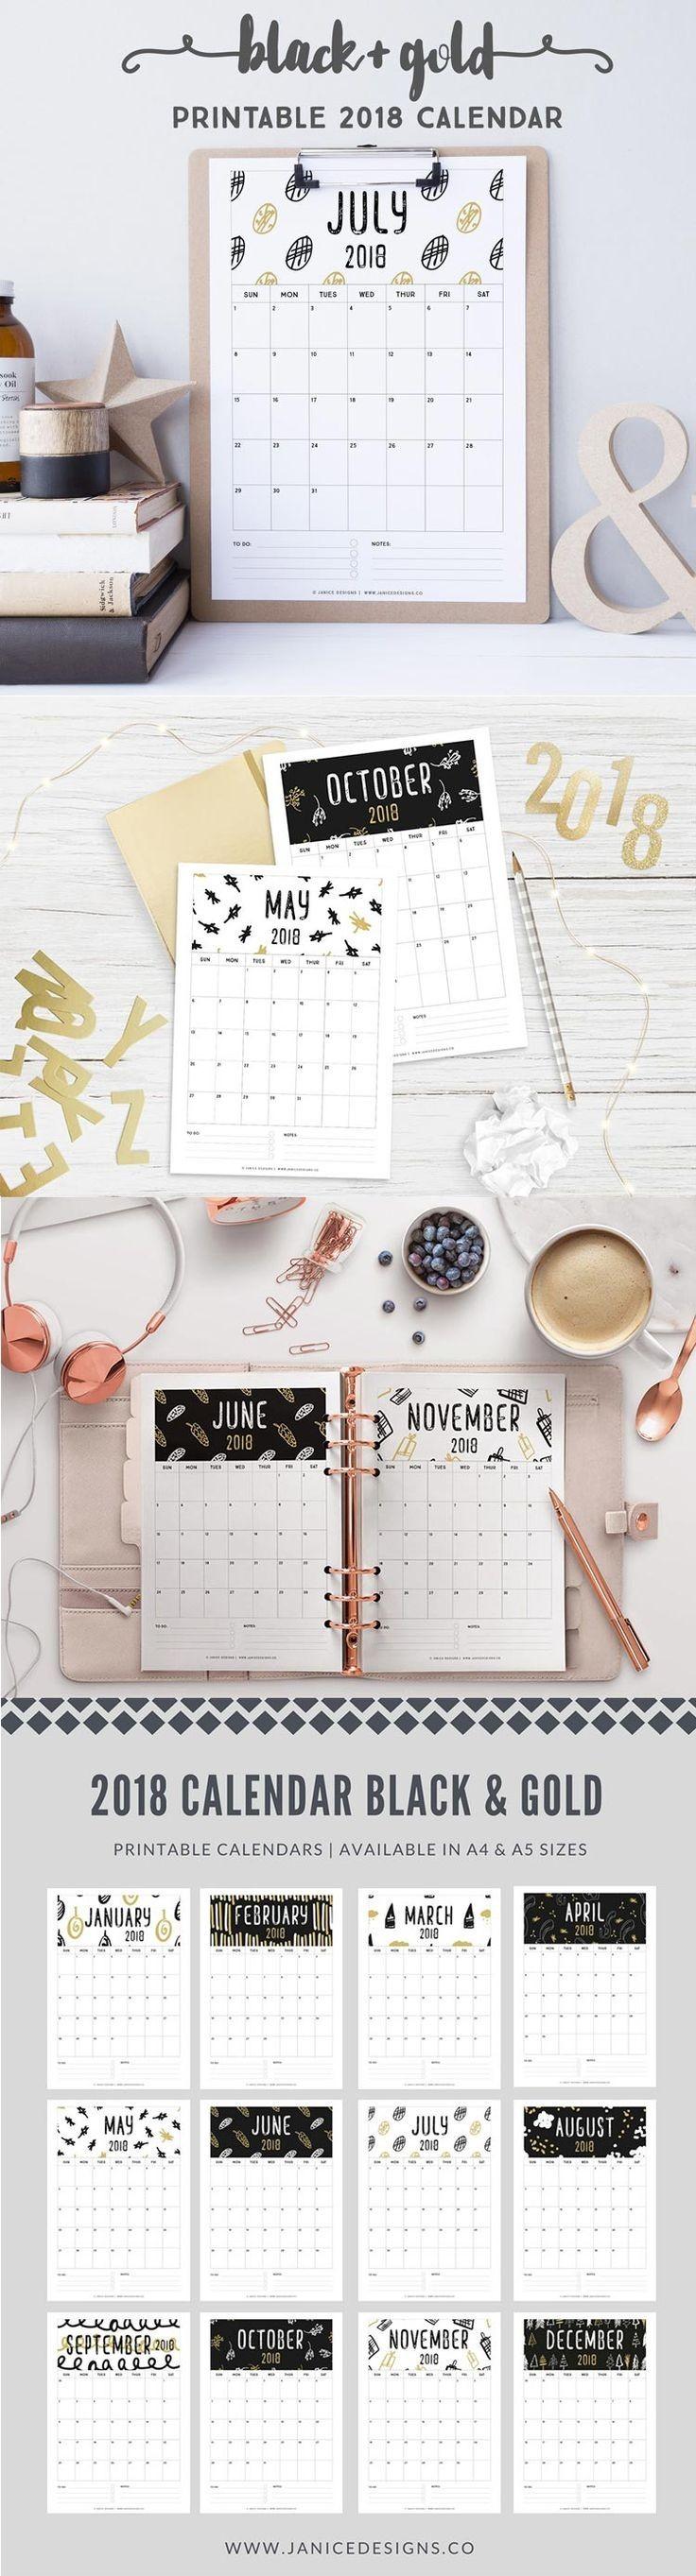 2018 Calendar Black & Gold